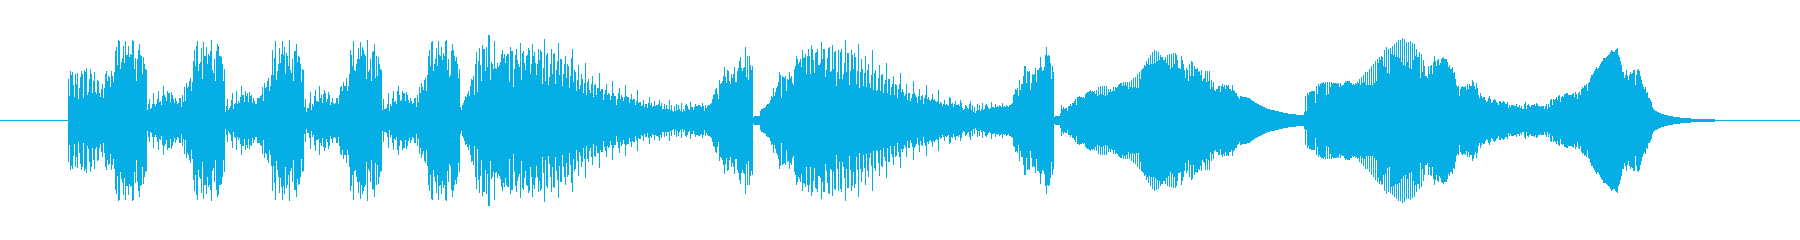 Electrozapperスワイプ3の再生済みの波形